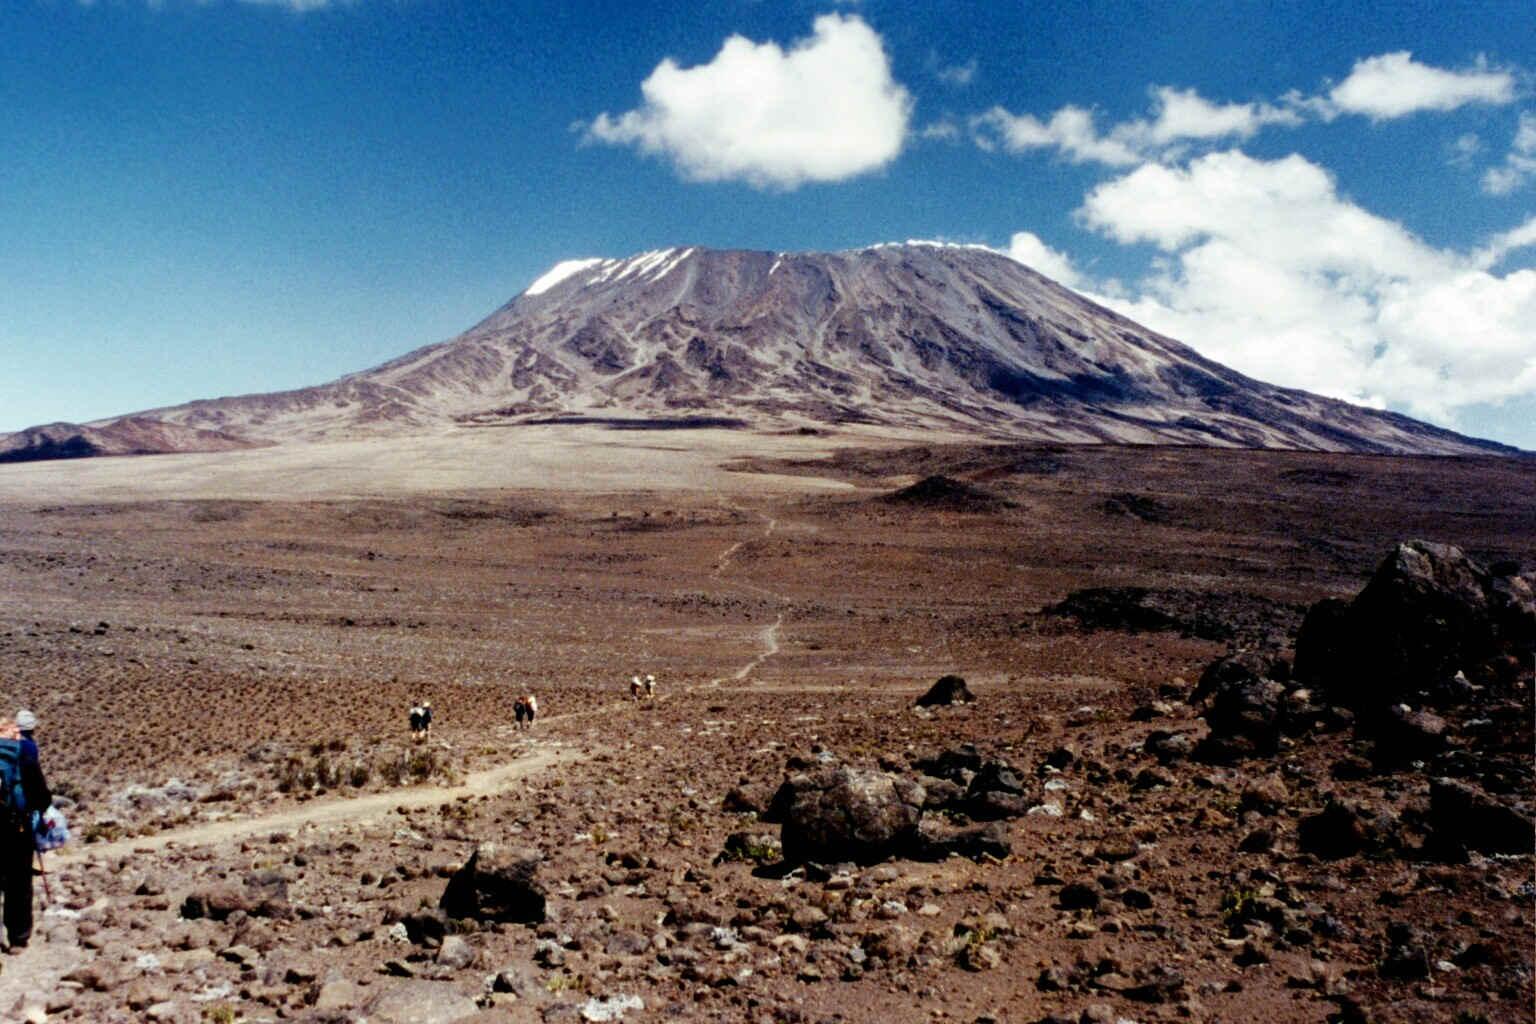 wp-content/uploads/itineraries/Kilimanjaro/kili-rongai-day4.jpg